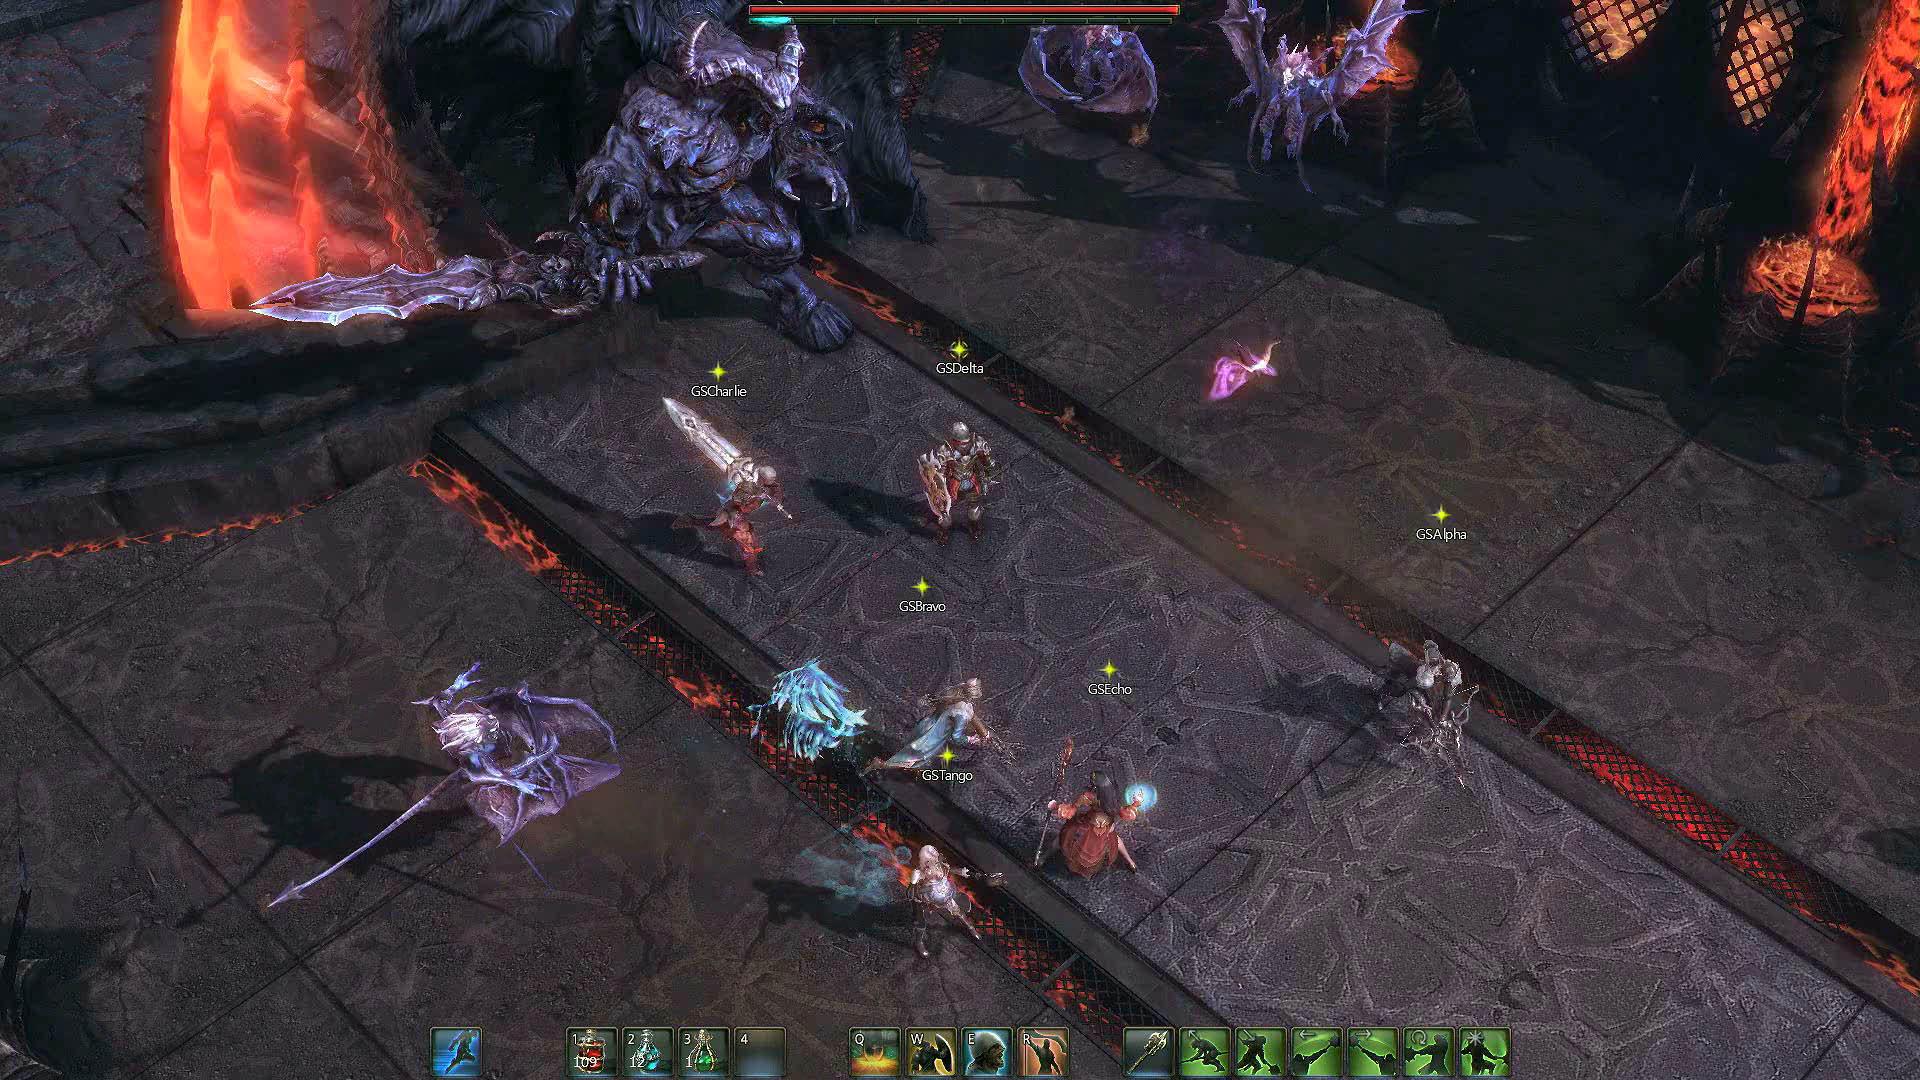 http://www.warlegend.net/wp-content/uploads/lineage-eternal-gameplay.jpg?038c14